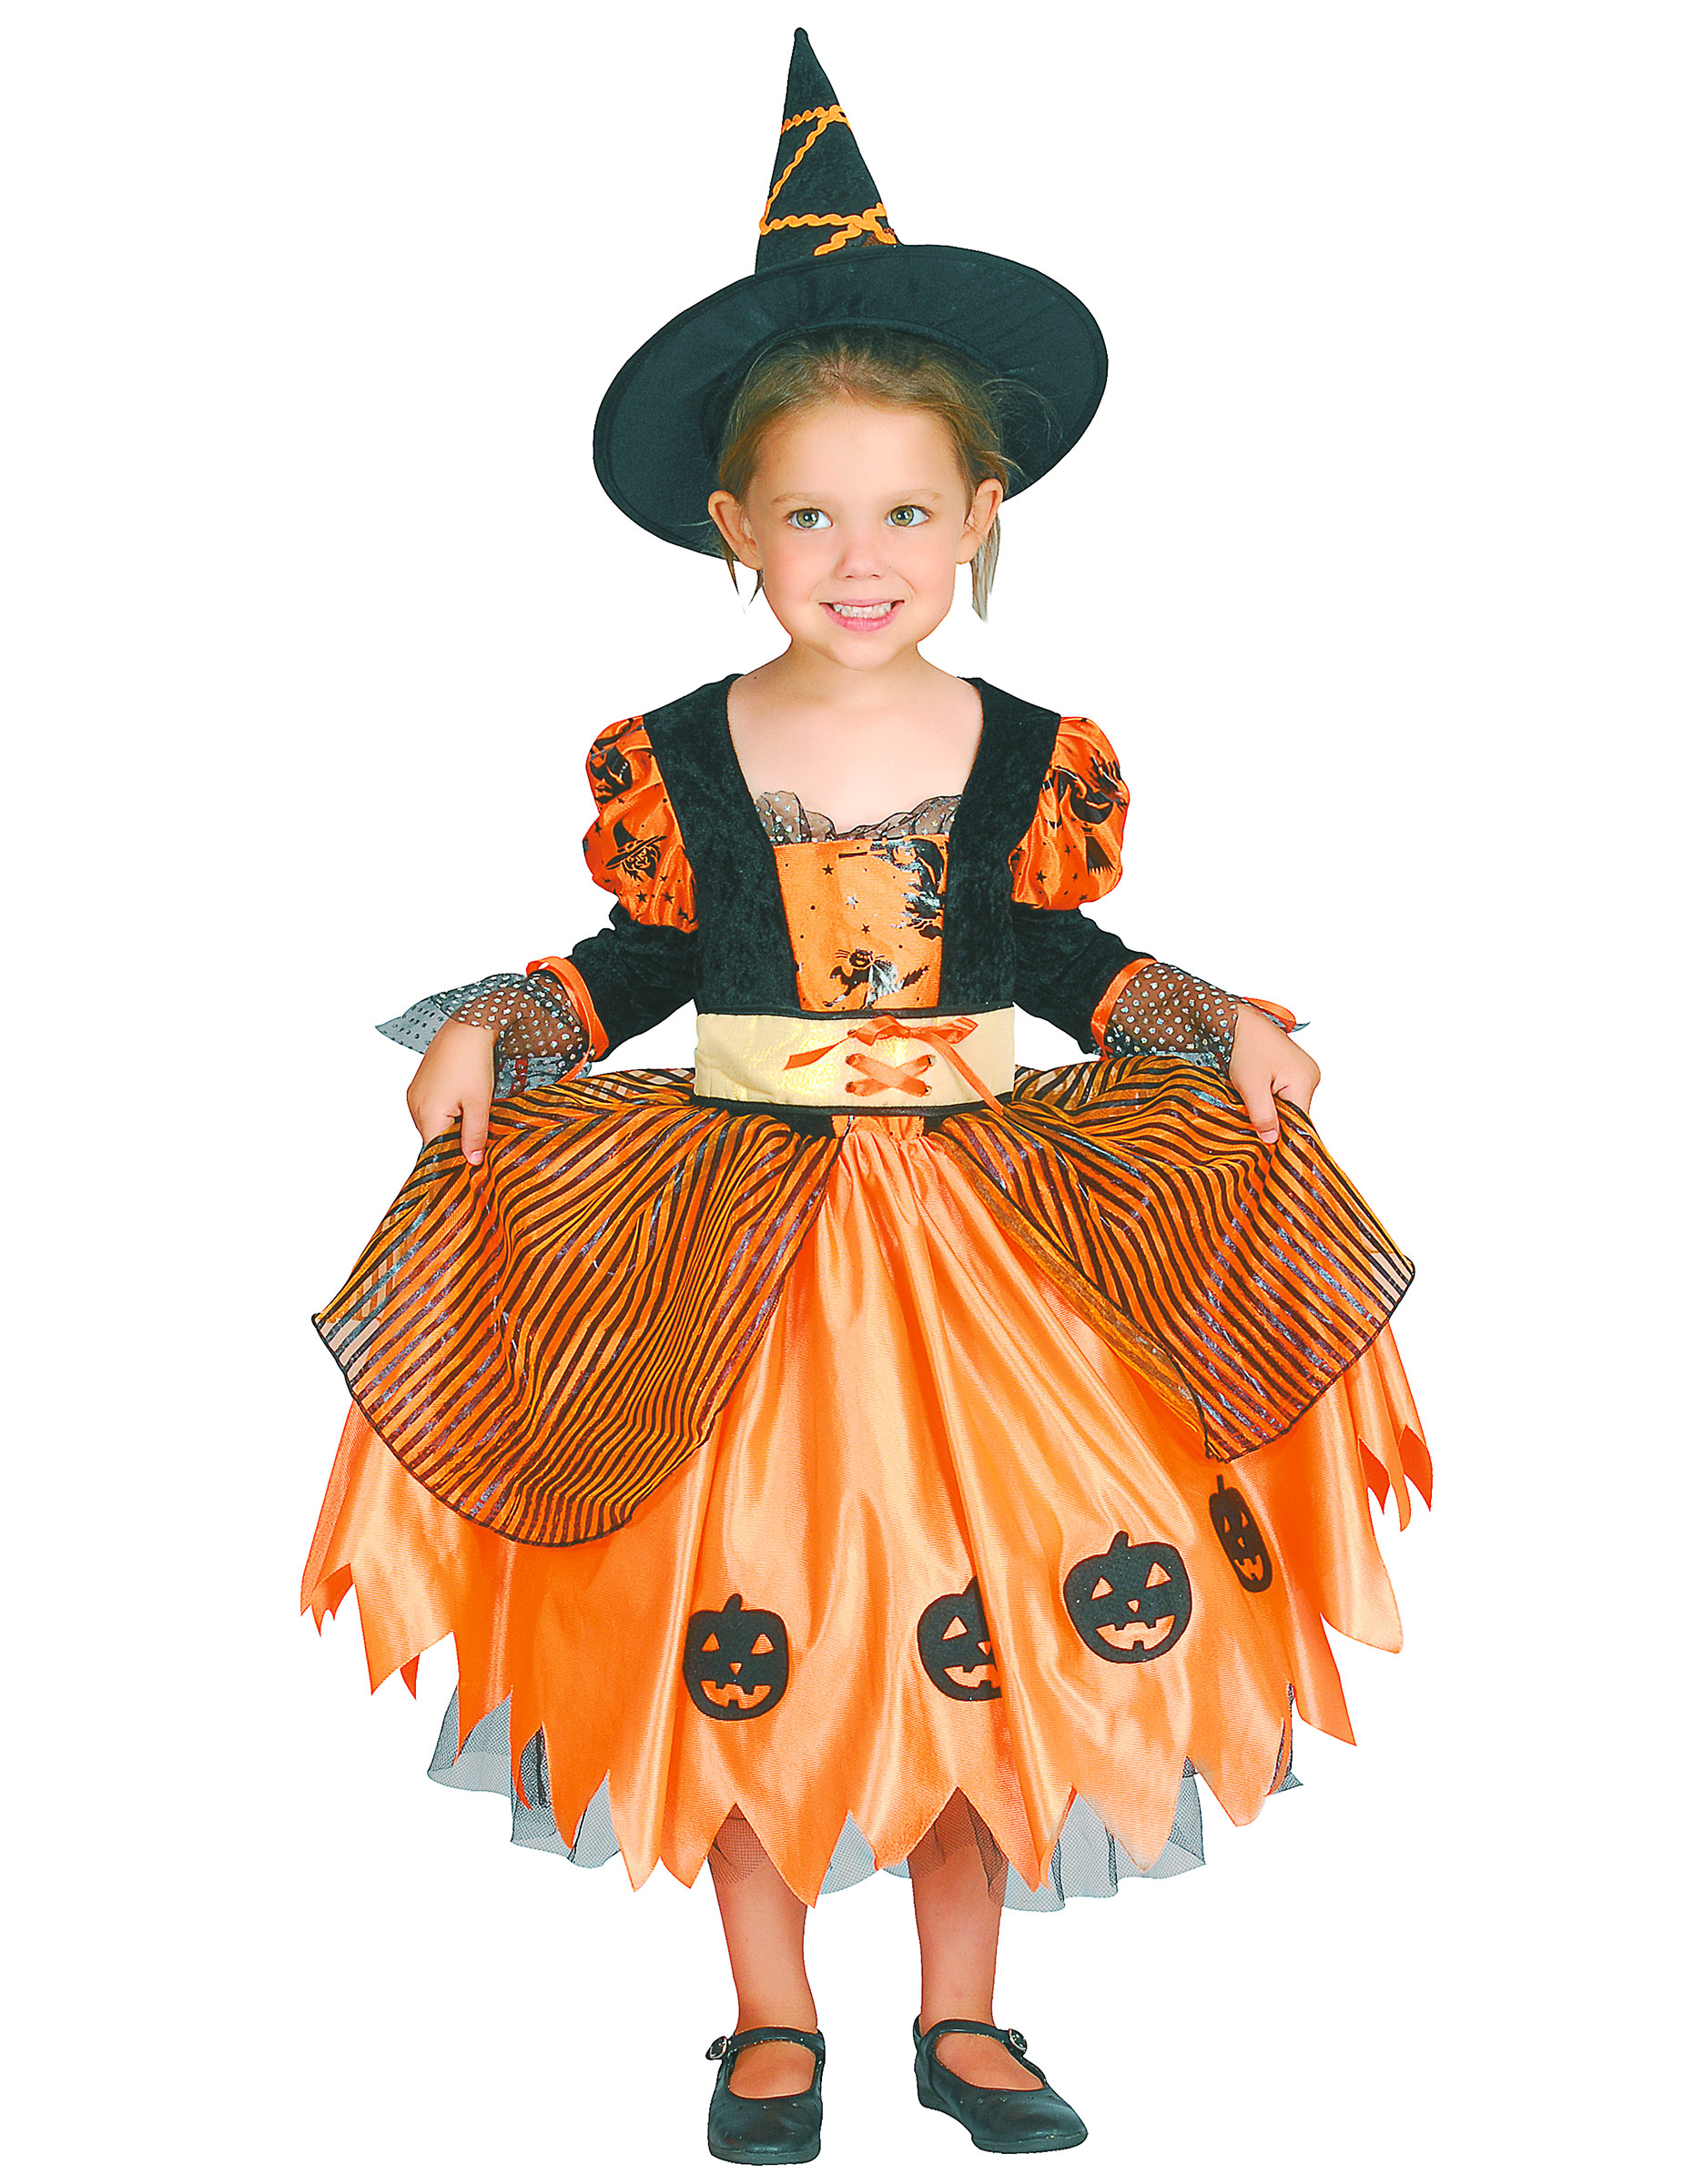 1d01b0ad5 Disfarce de bruxa rapariga Halloween  Disfarces Crianças